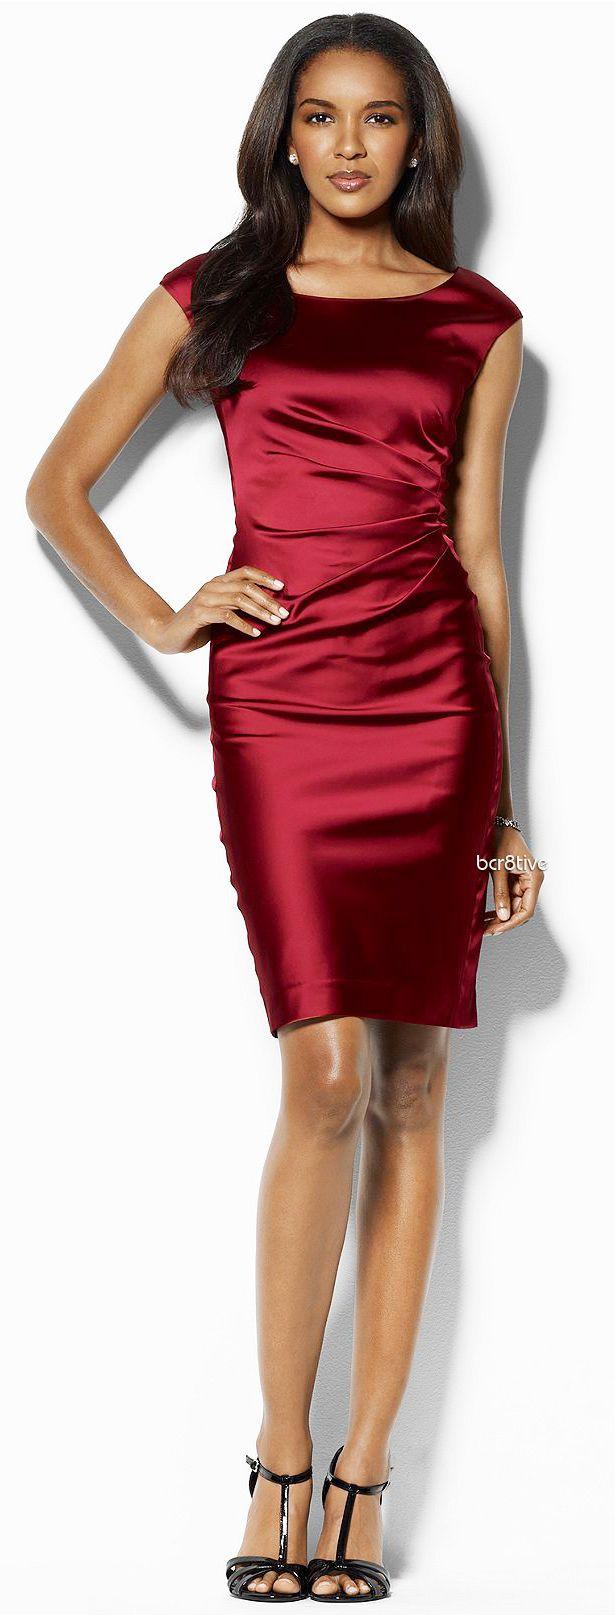 Top 25+ best Red cocktail dress ideas on Pinterest | Red dress ...